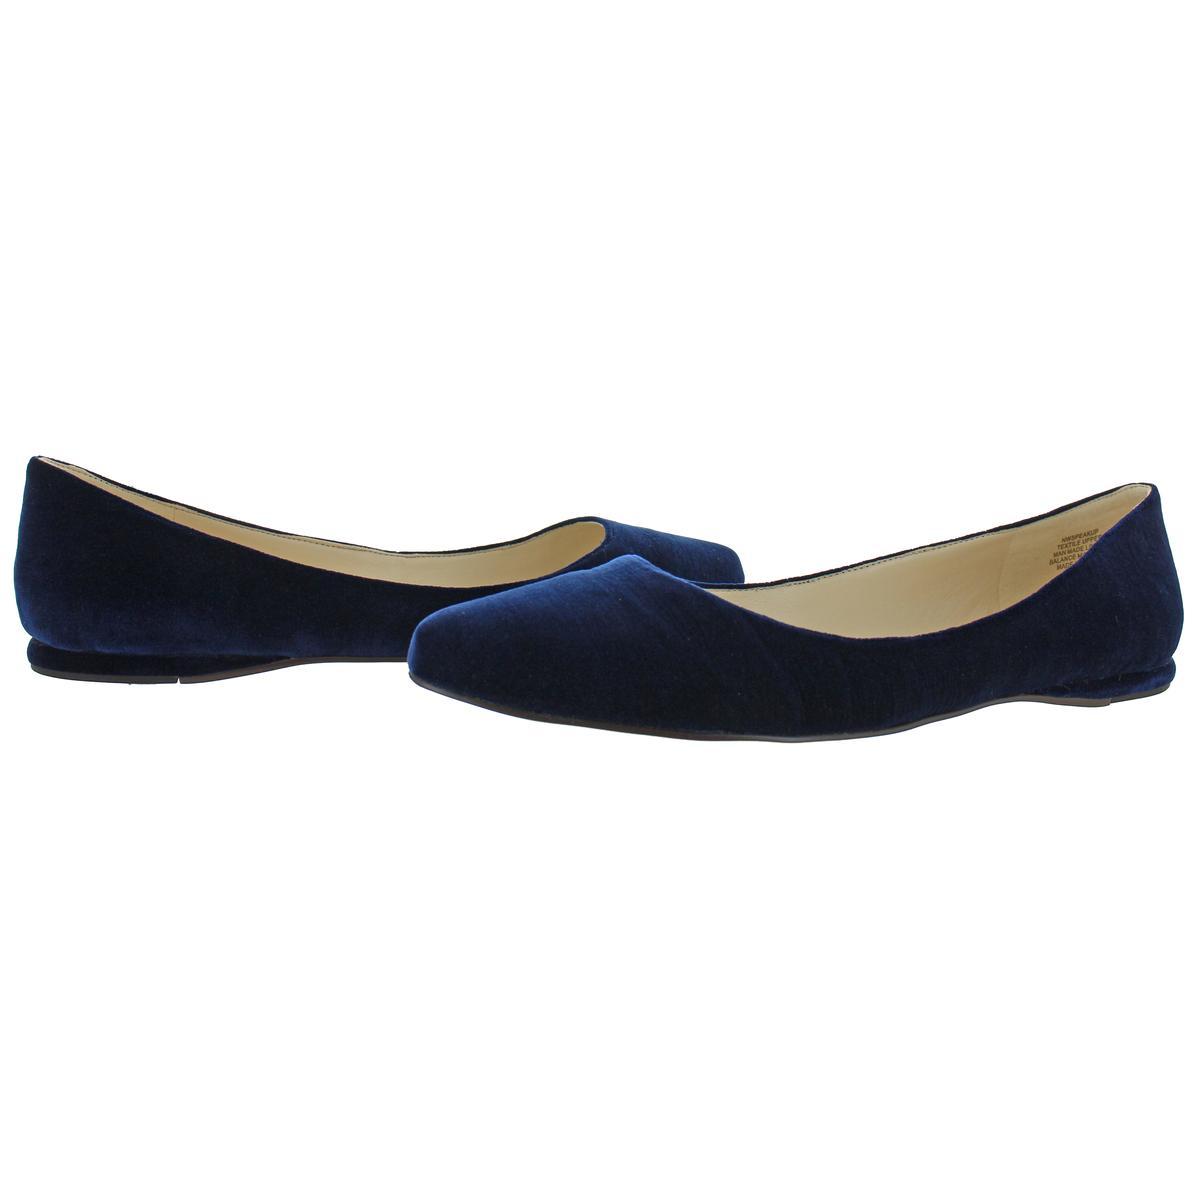 Nine-West-Womens-Speak-Up-Ballet-Flats-Shoes-BHFO-4833 thumbnail 5